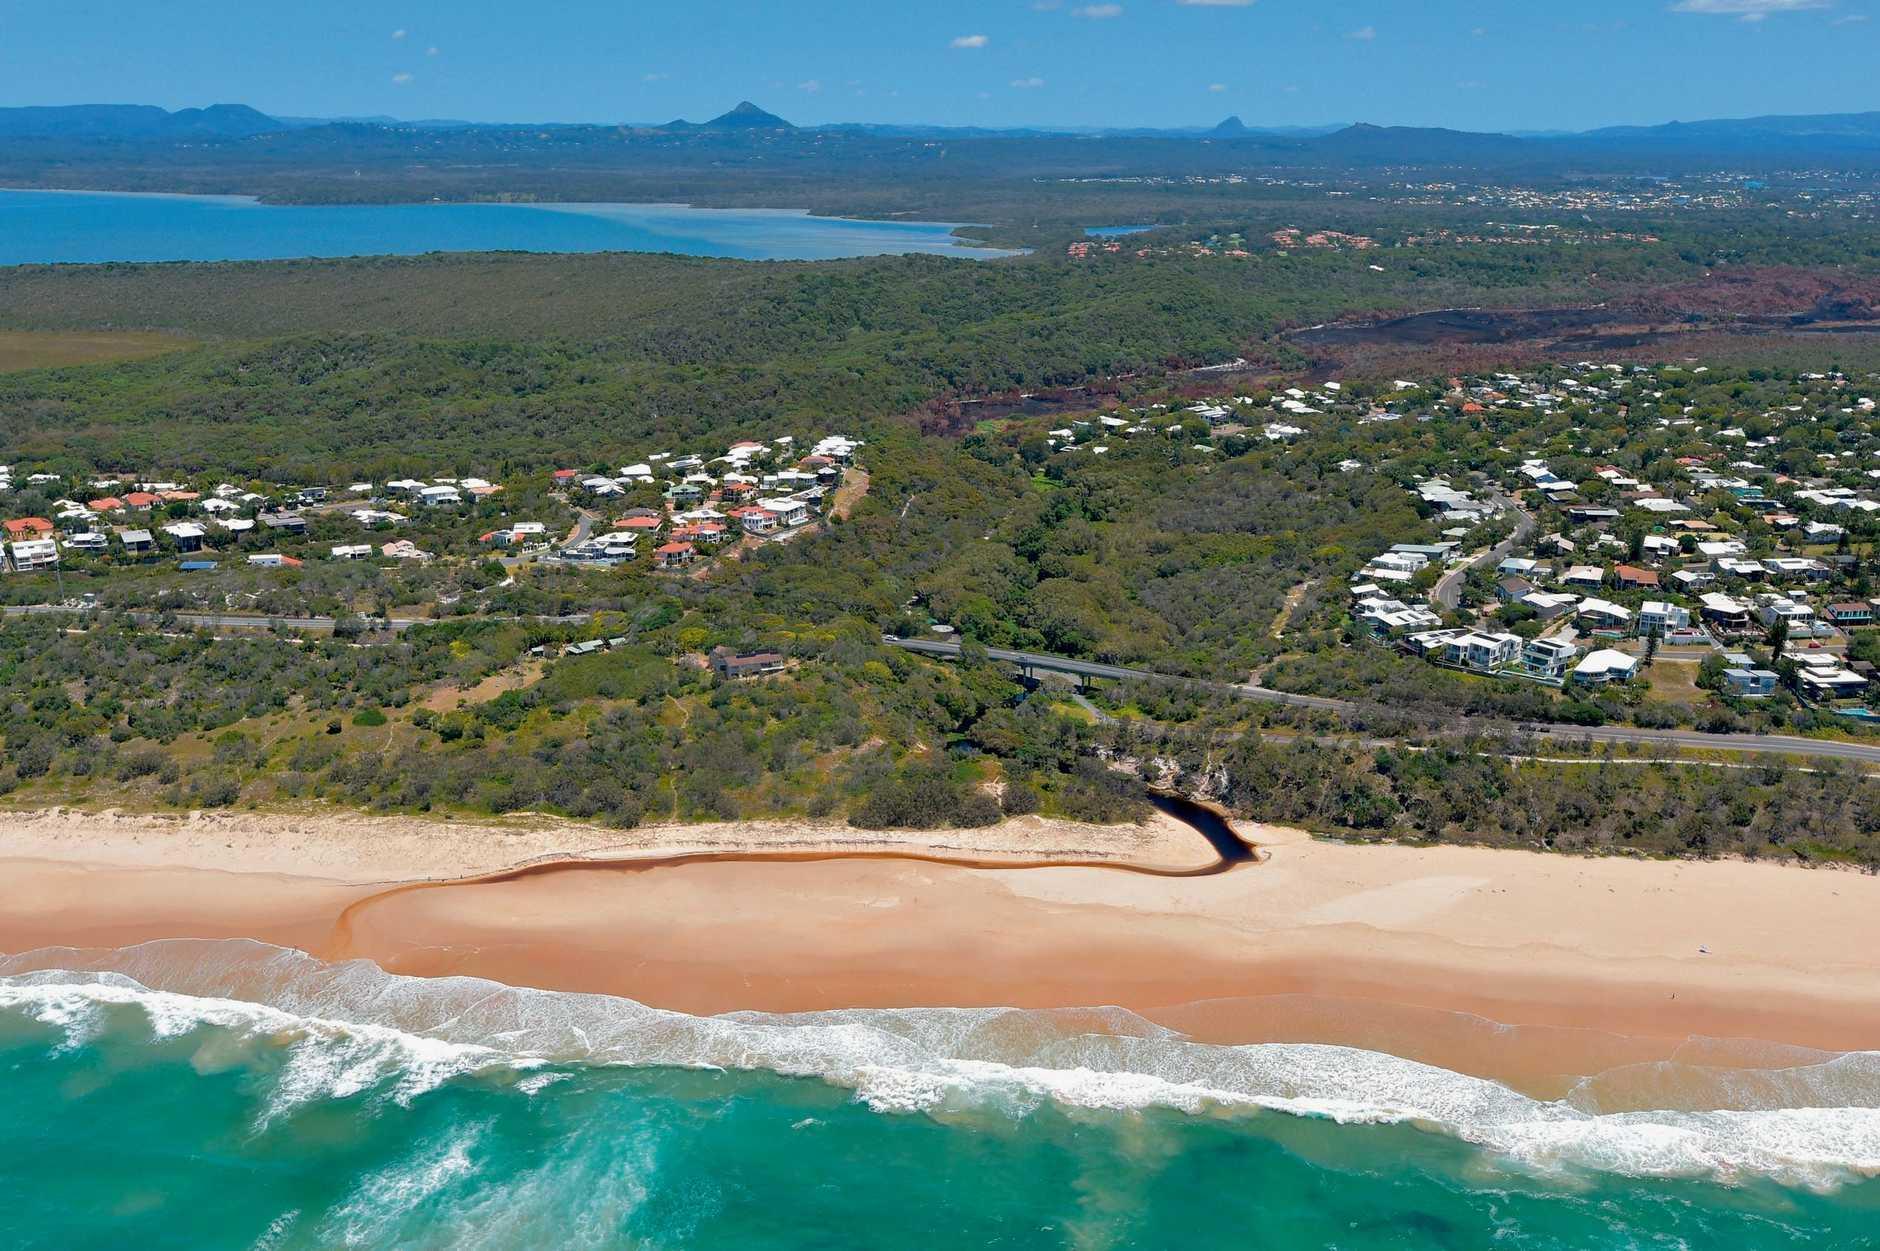 Aerials of the Sunshine Coast taken on Thursday 23 October, 2014 for advertising feature: Castaways Beach and Sunrise Beach. Photo: Brett Wortman / Sunshine Coast Daily